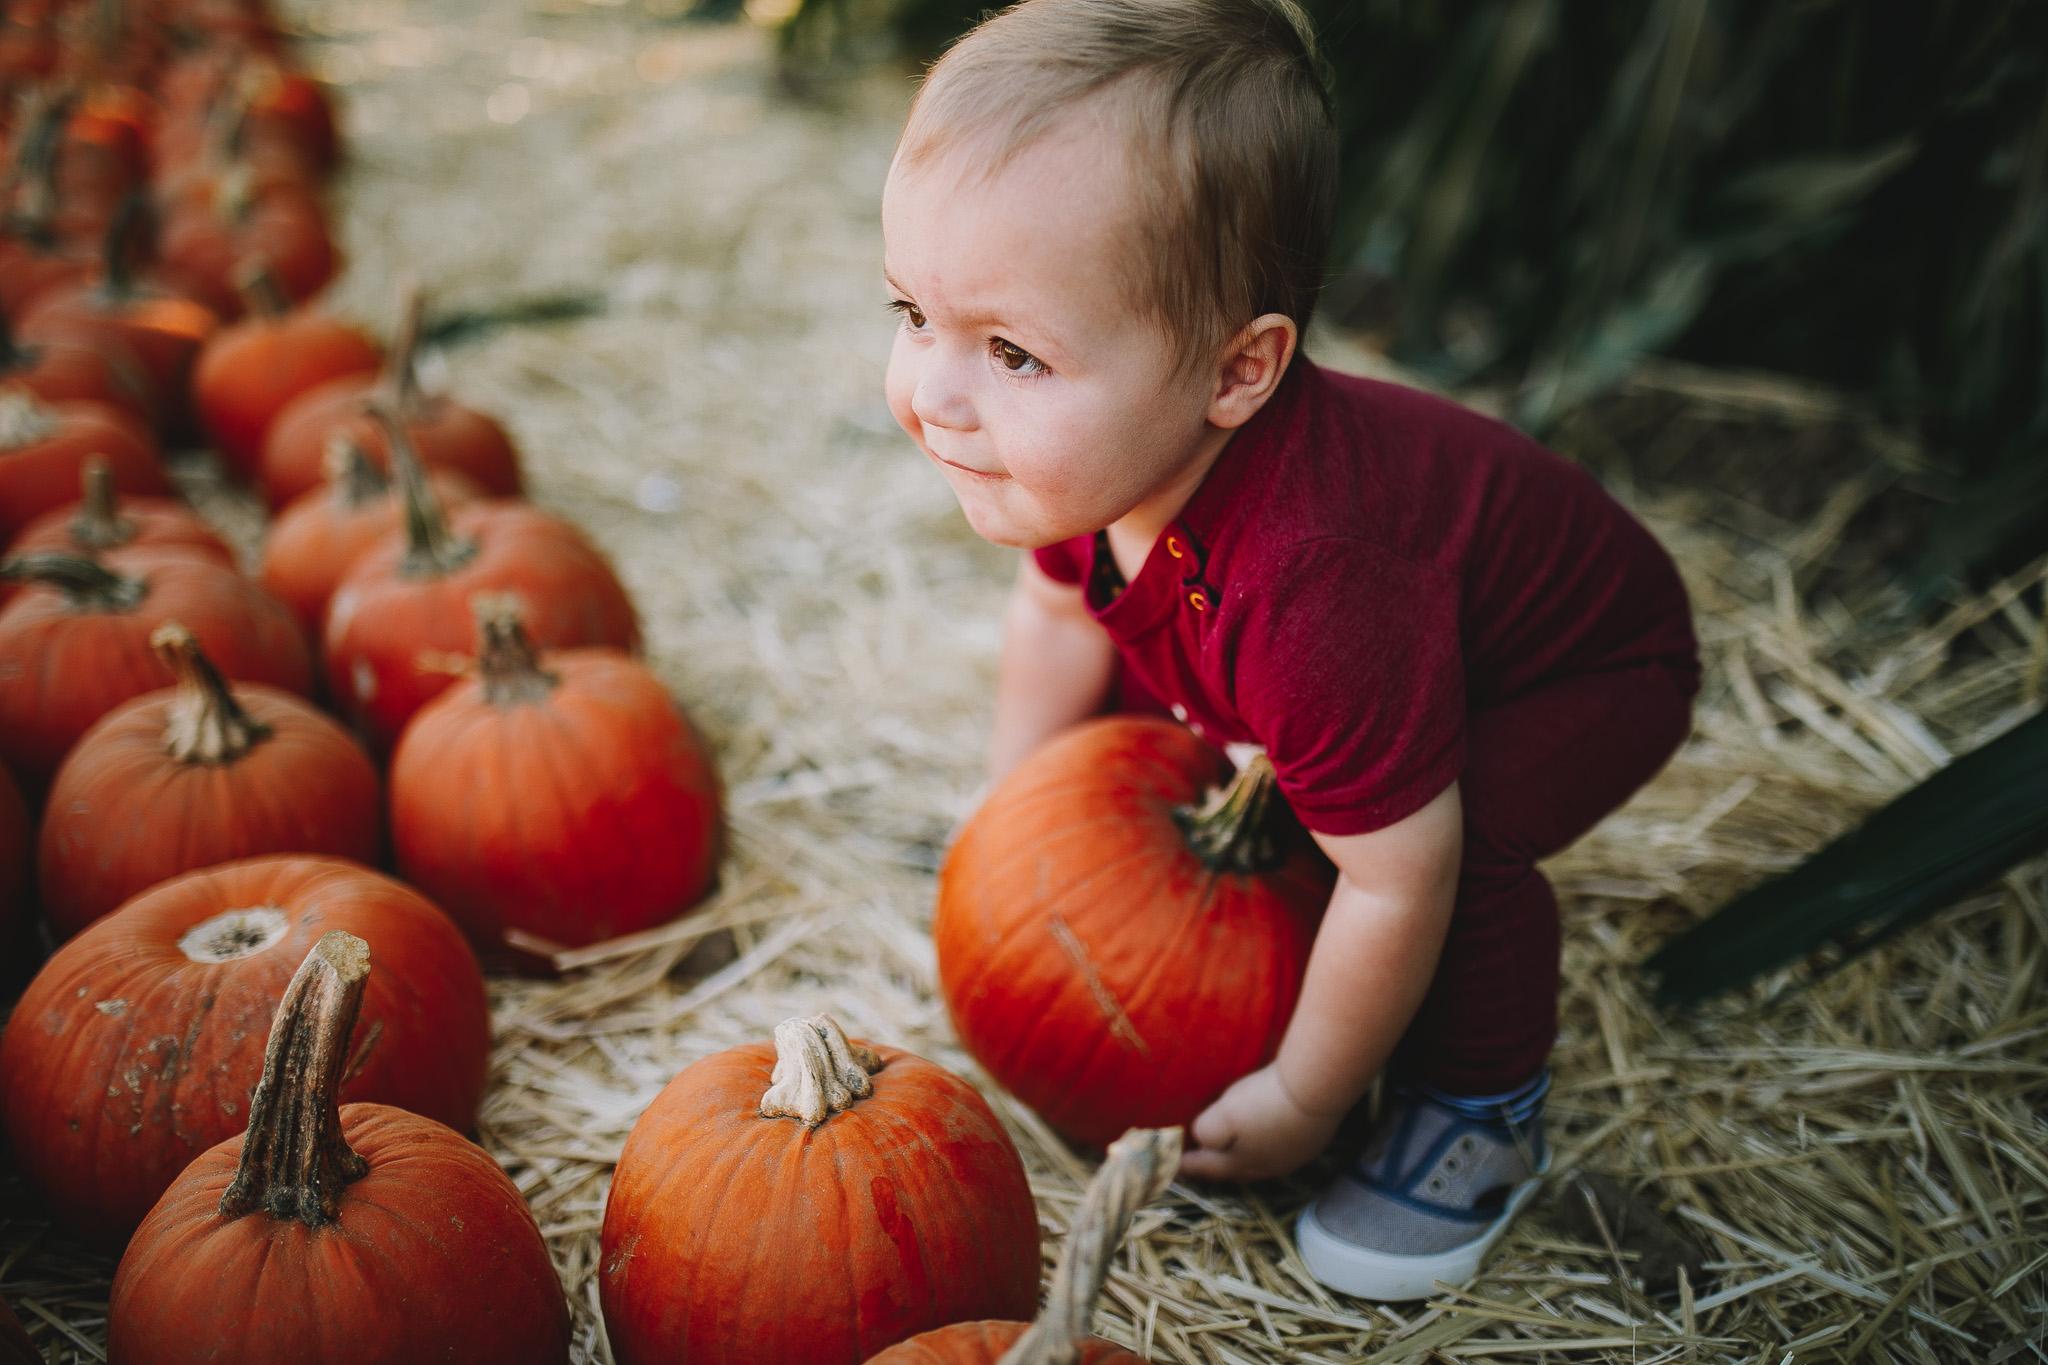 Archer_Inspired_Photography_Pumpkin_Patch_Morgan_Hill_Fall_Family_Photos-41.jpg